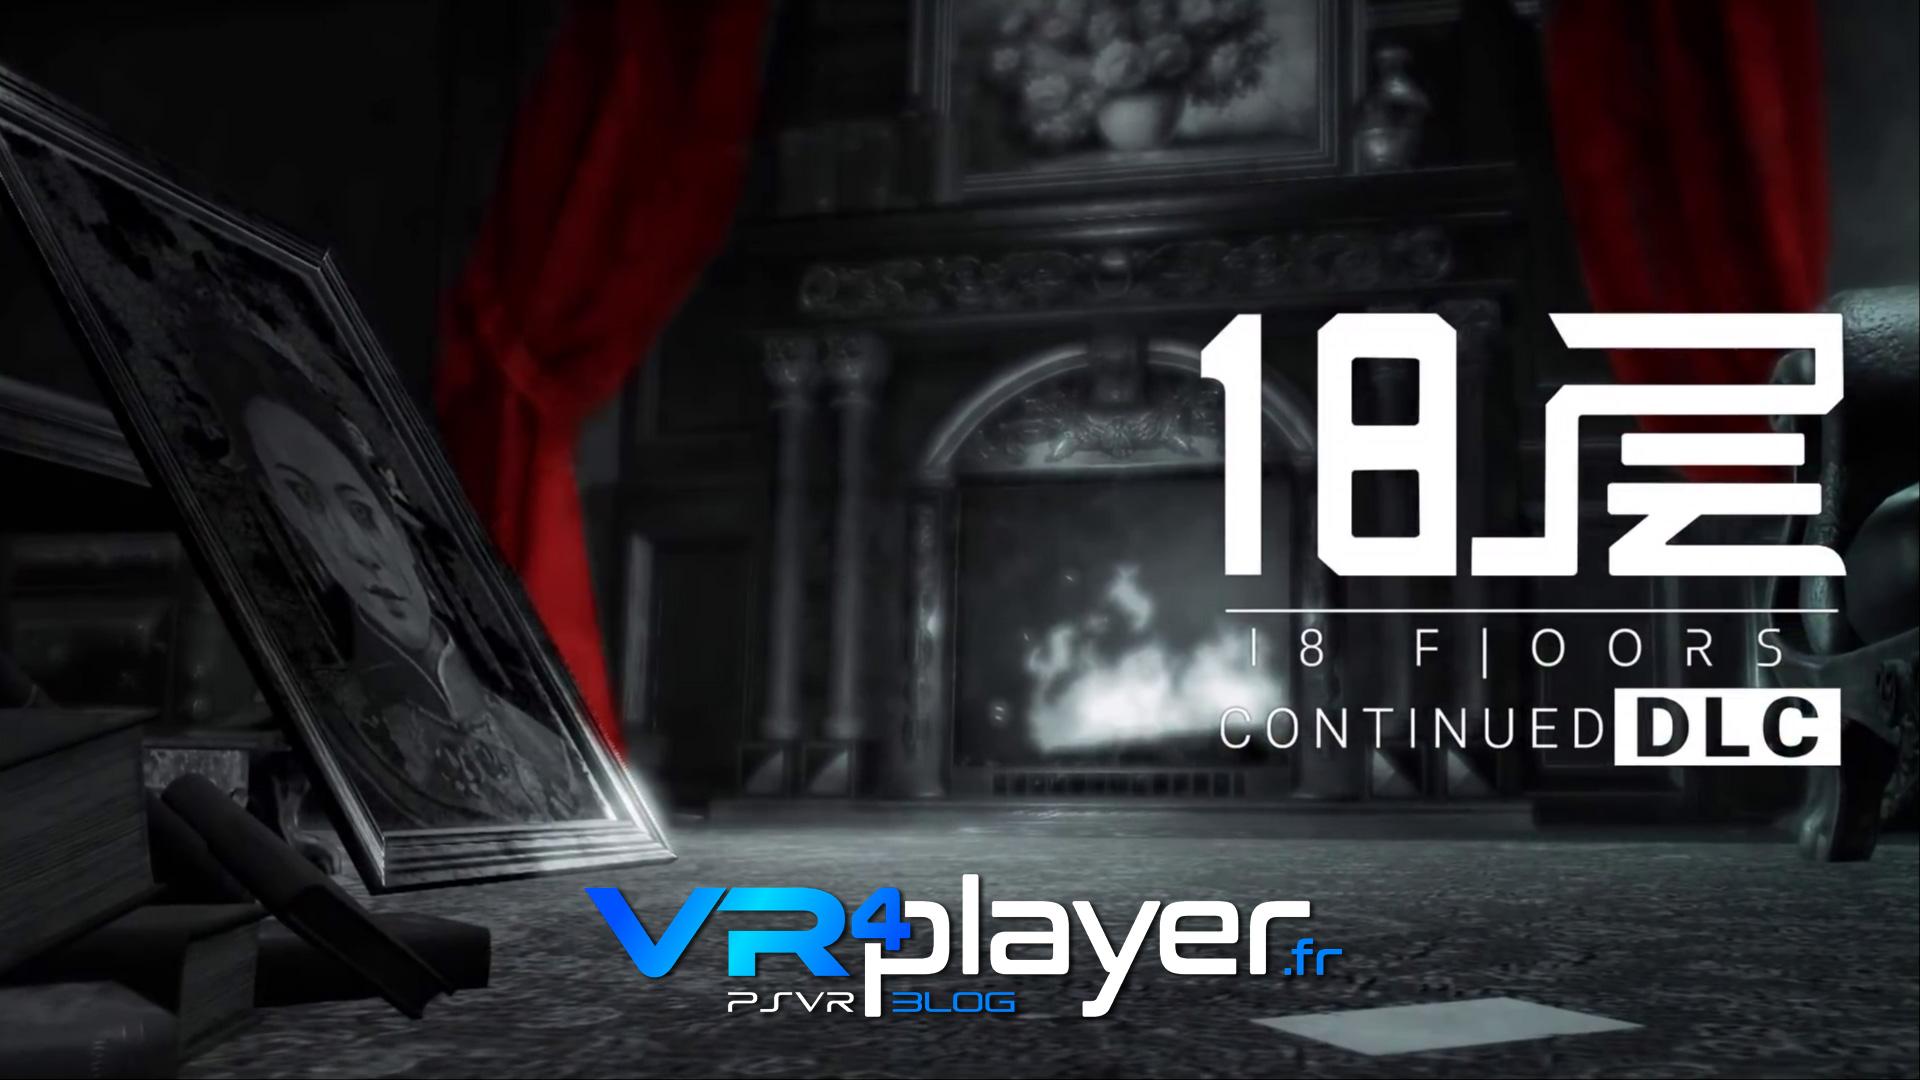 18 floors playstation vr vr4player.fr